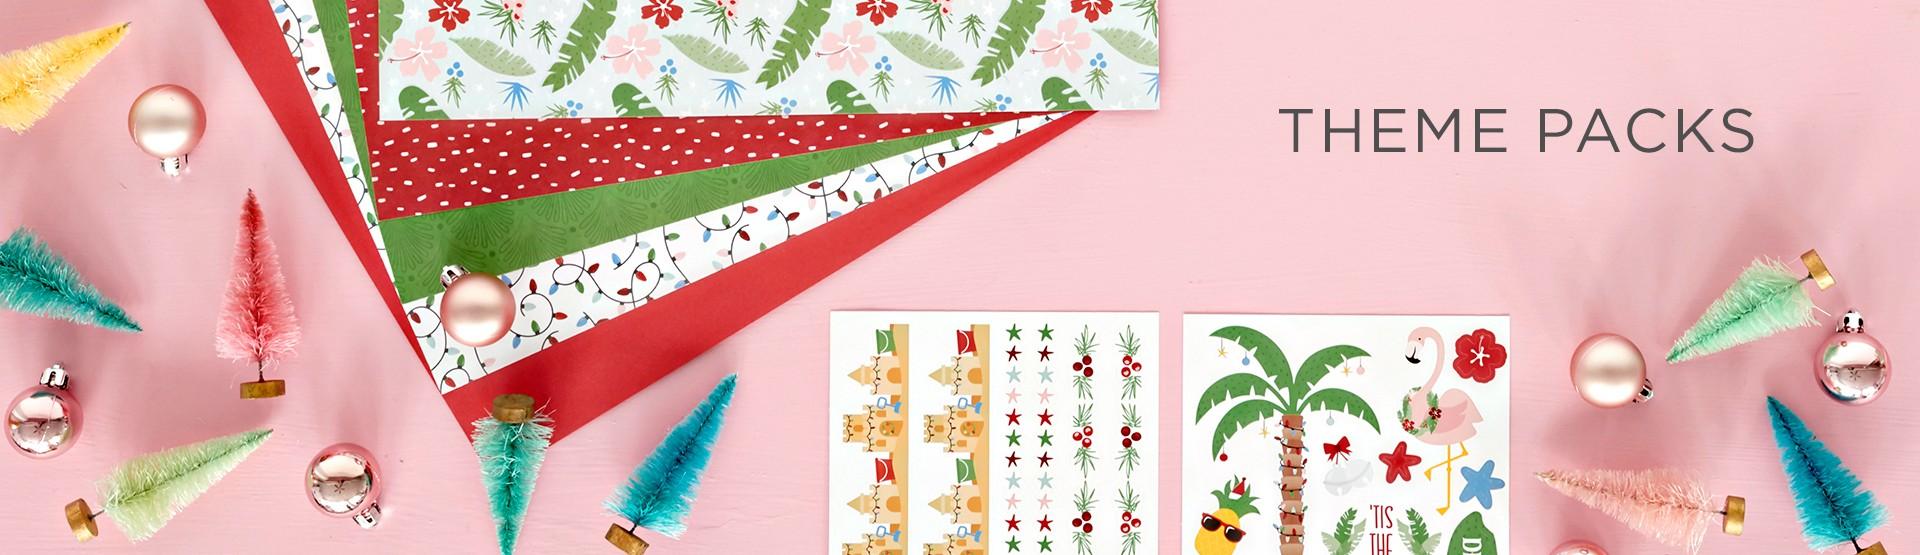 Theme Packs: Scrapbook Kits